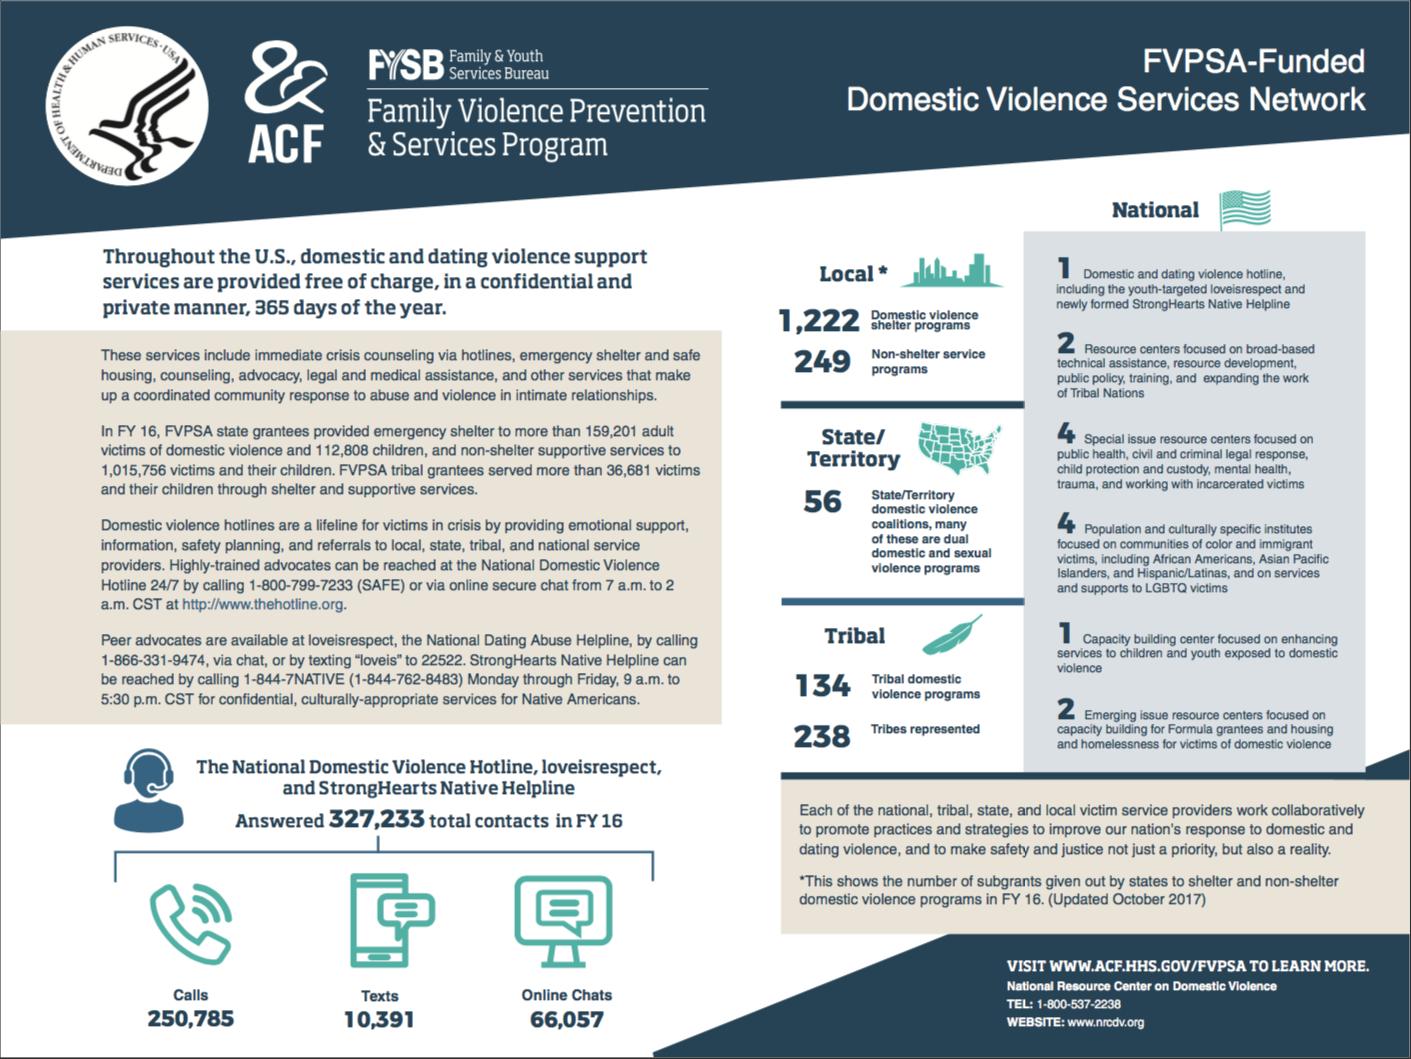 FVPSA-FundedDVServices-2017.png